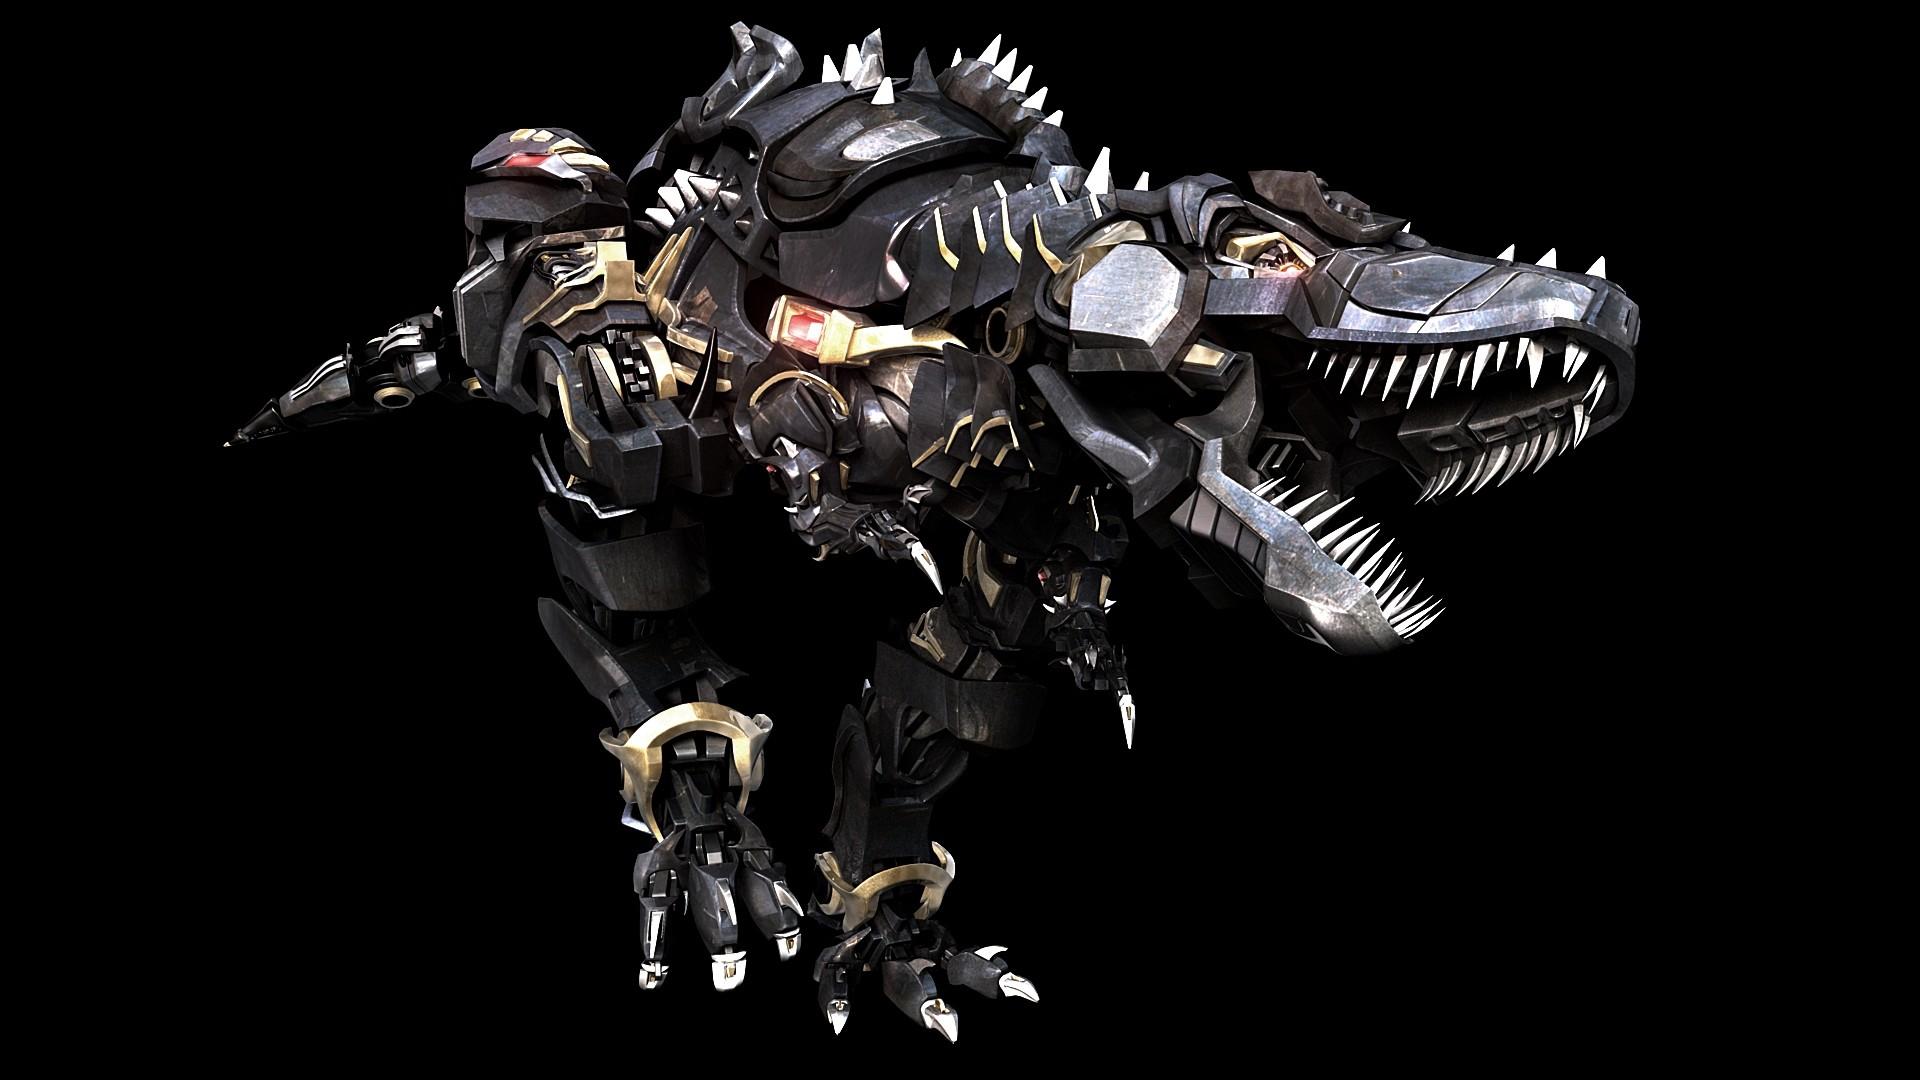 Transformers Dinobots Wallpaper 1280×960 Grimlock Wallpapers (46 Wallpapers)  | Adorable Wallpapers | Desktop | Pinterest | 3d wallpaper, Wallpaper and 3d